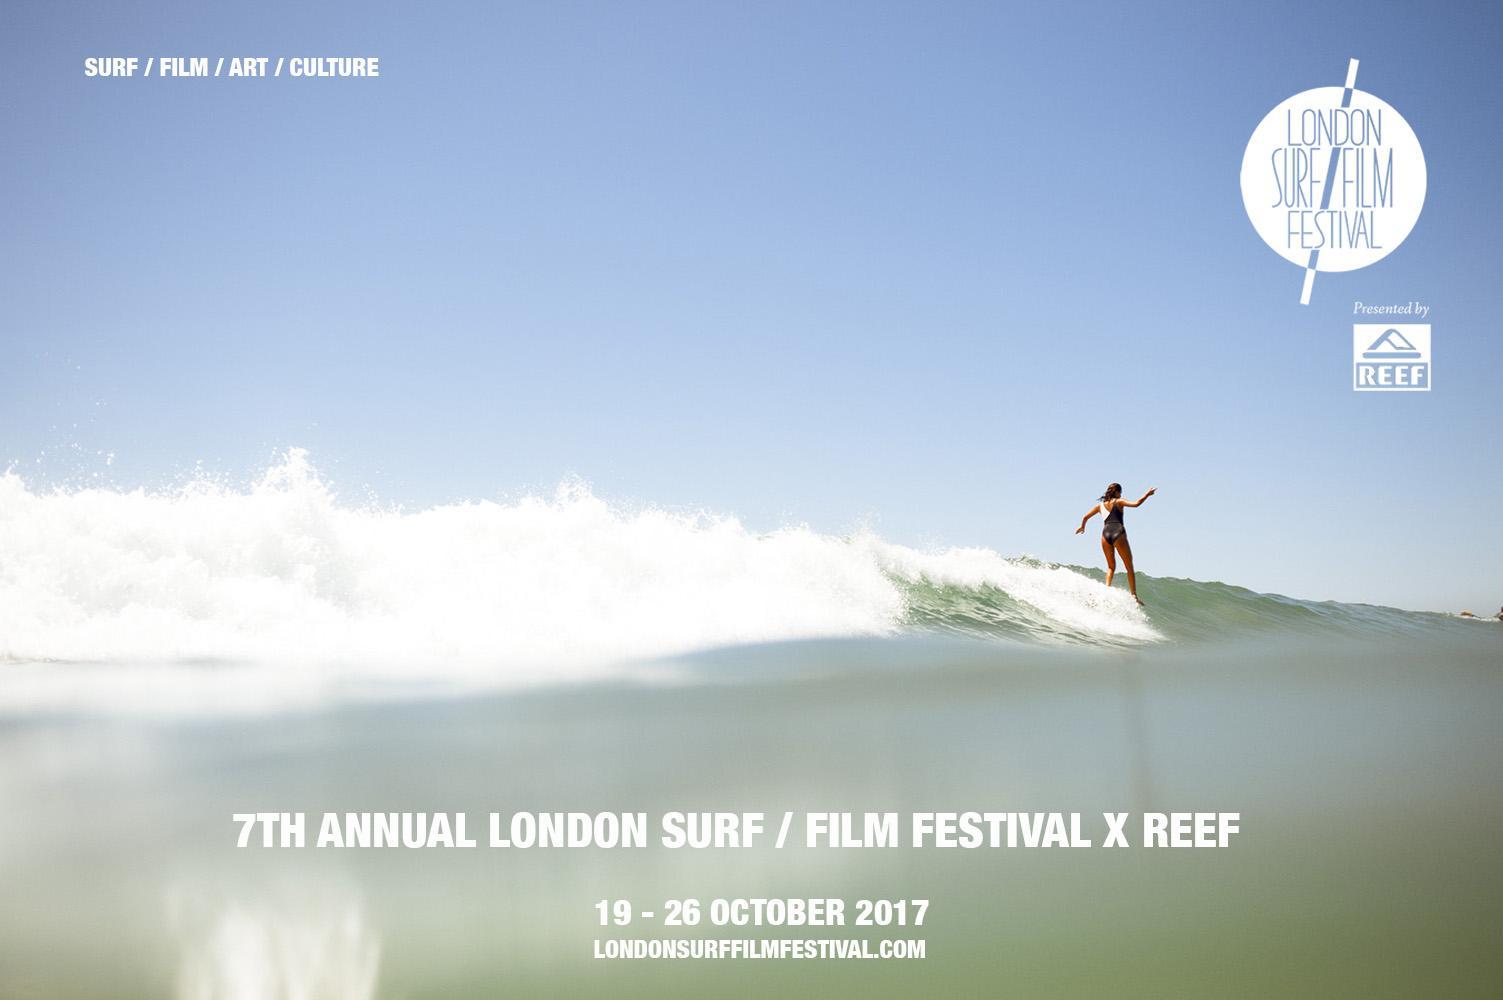 The London Film / Surf Festival